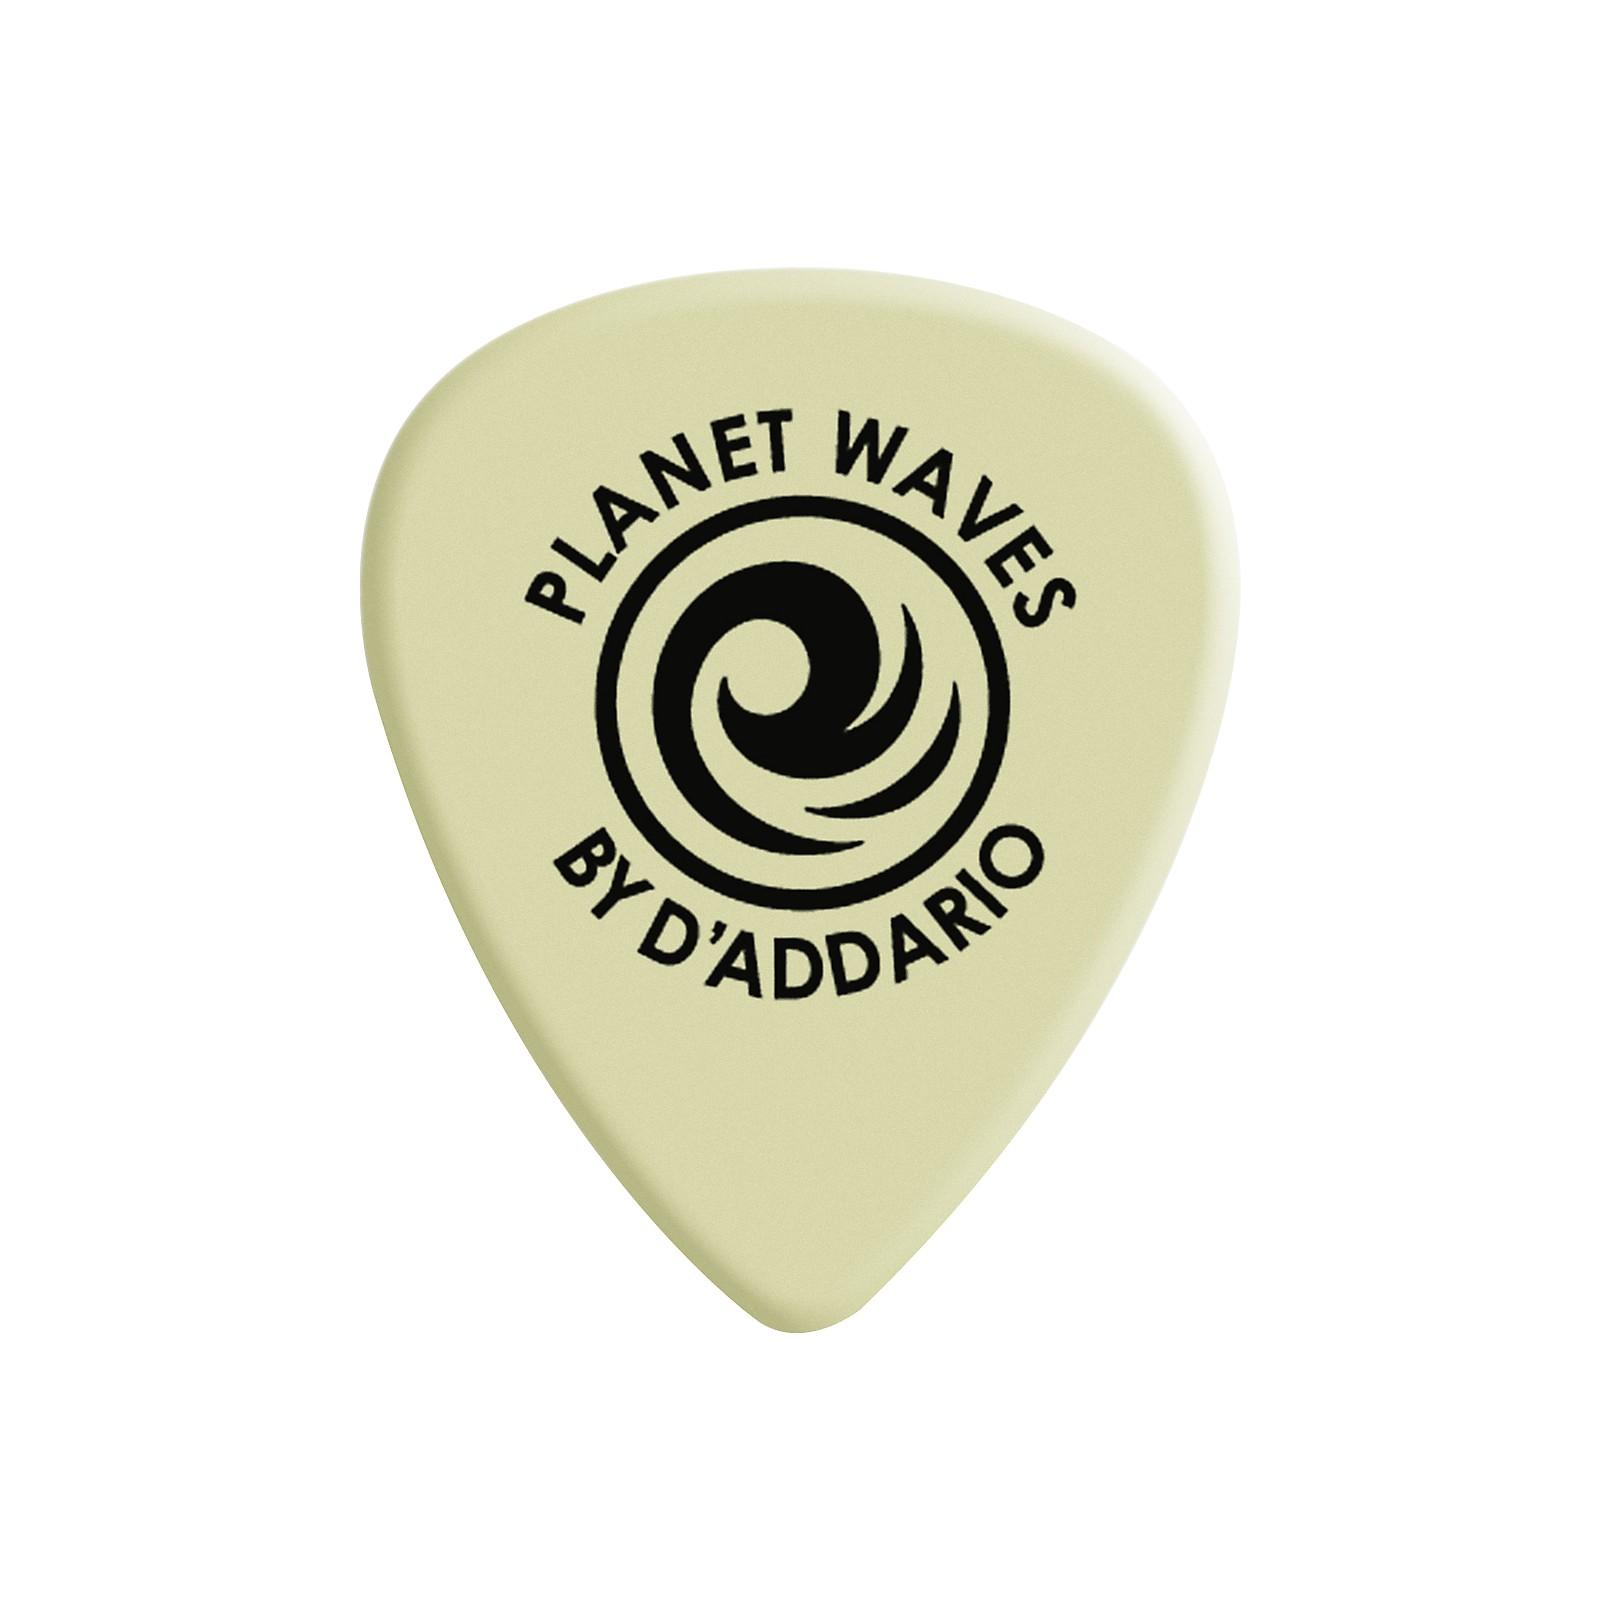 D'Addario Planet Waves Cortex Guitar Picks